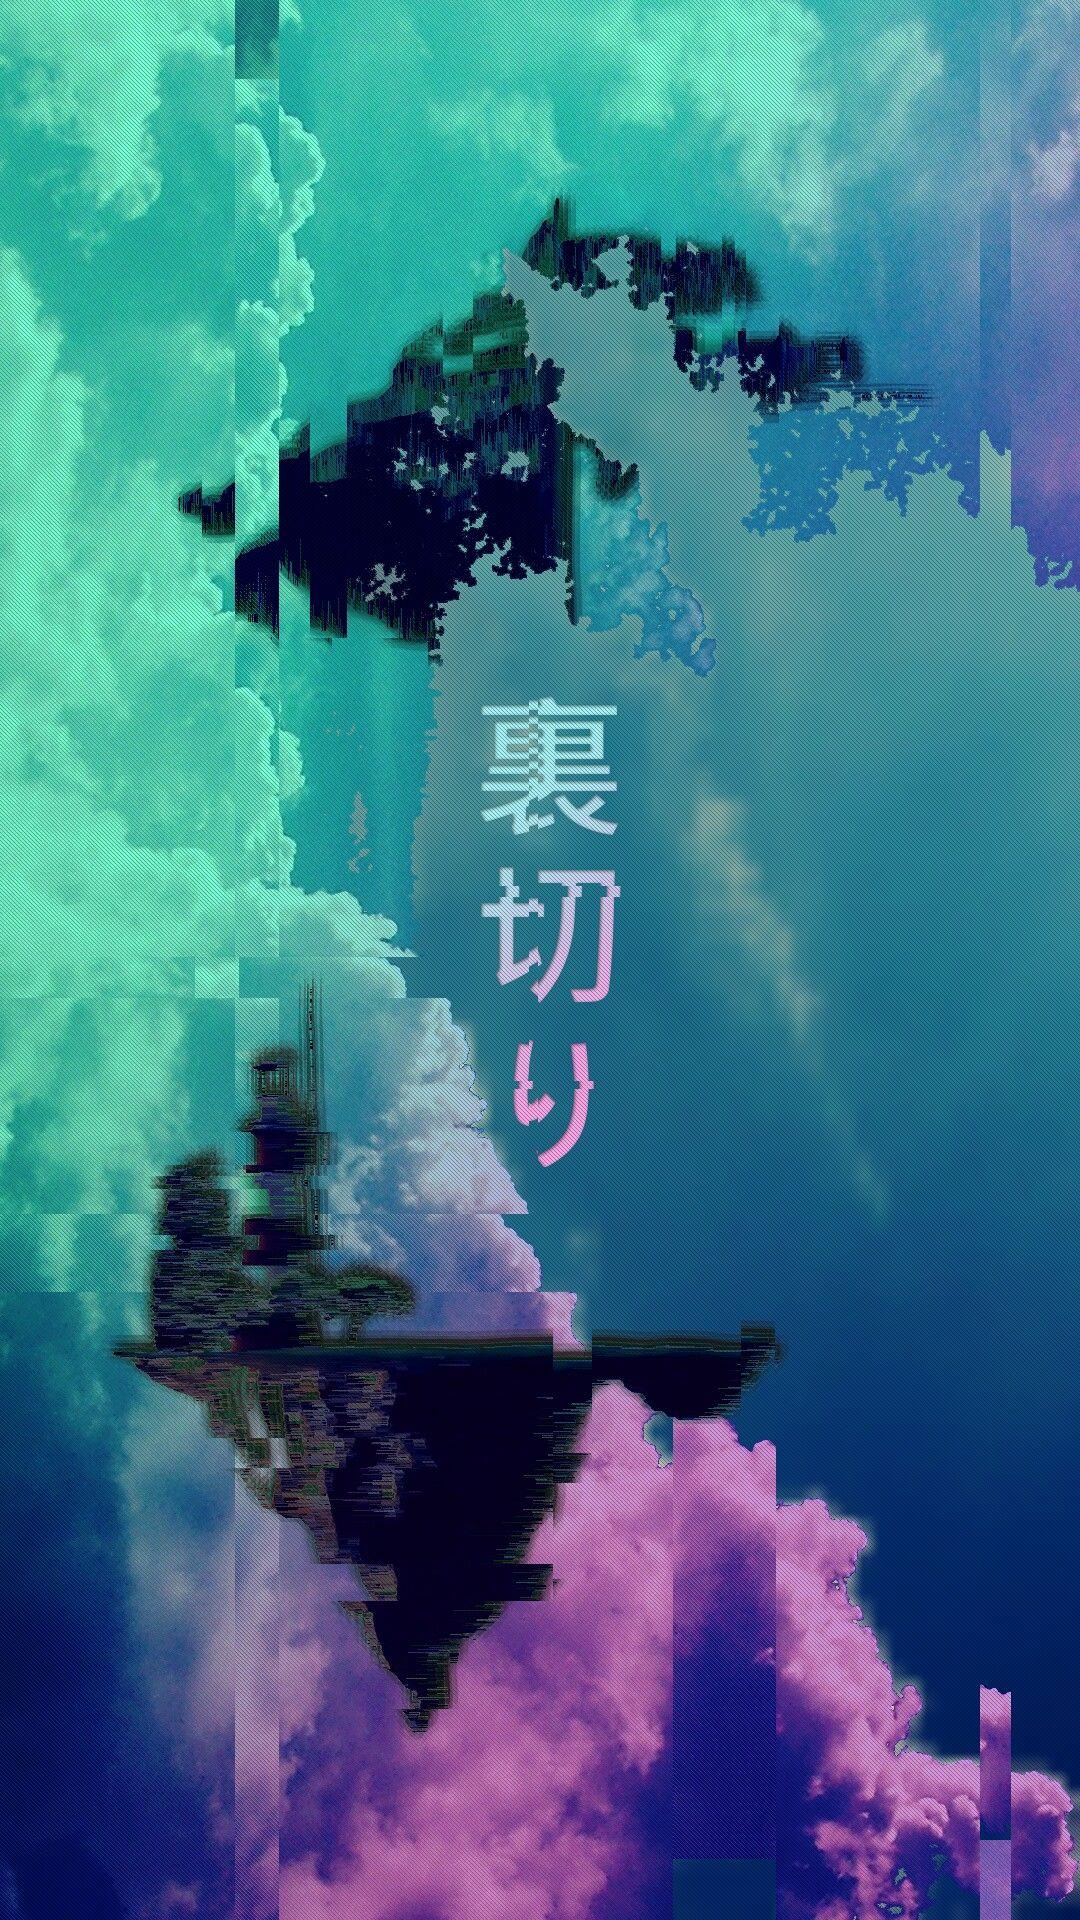 lofi anime aesthetic wallpapers